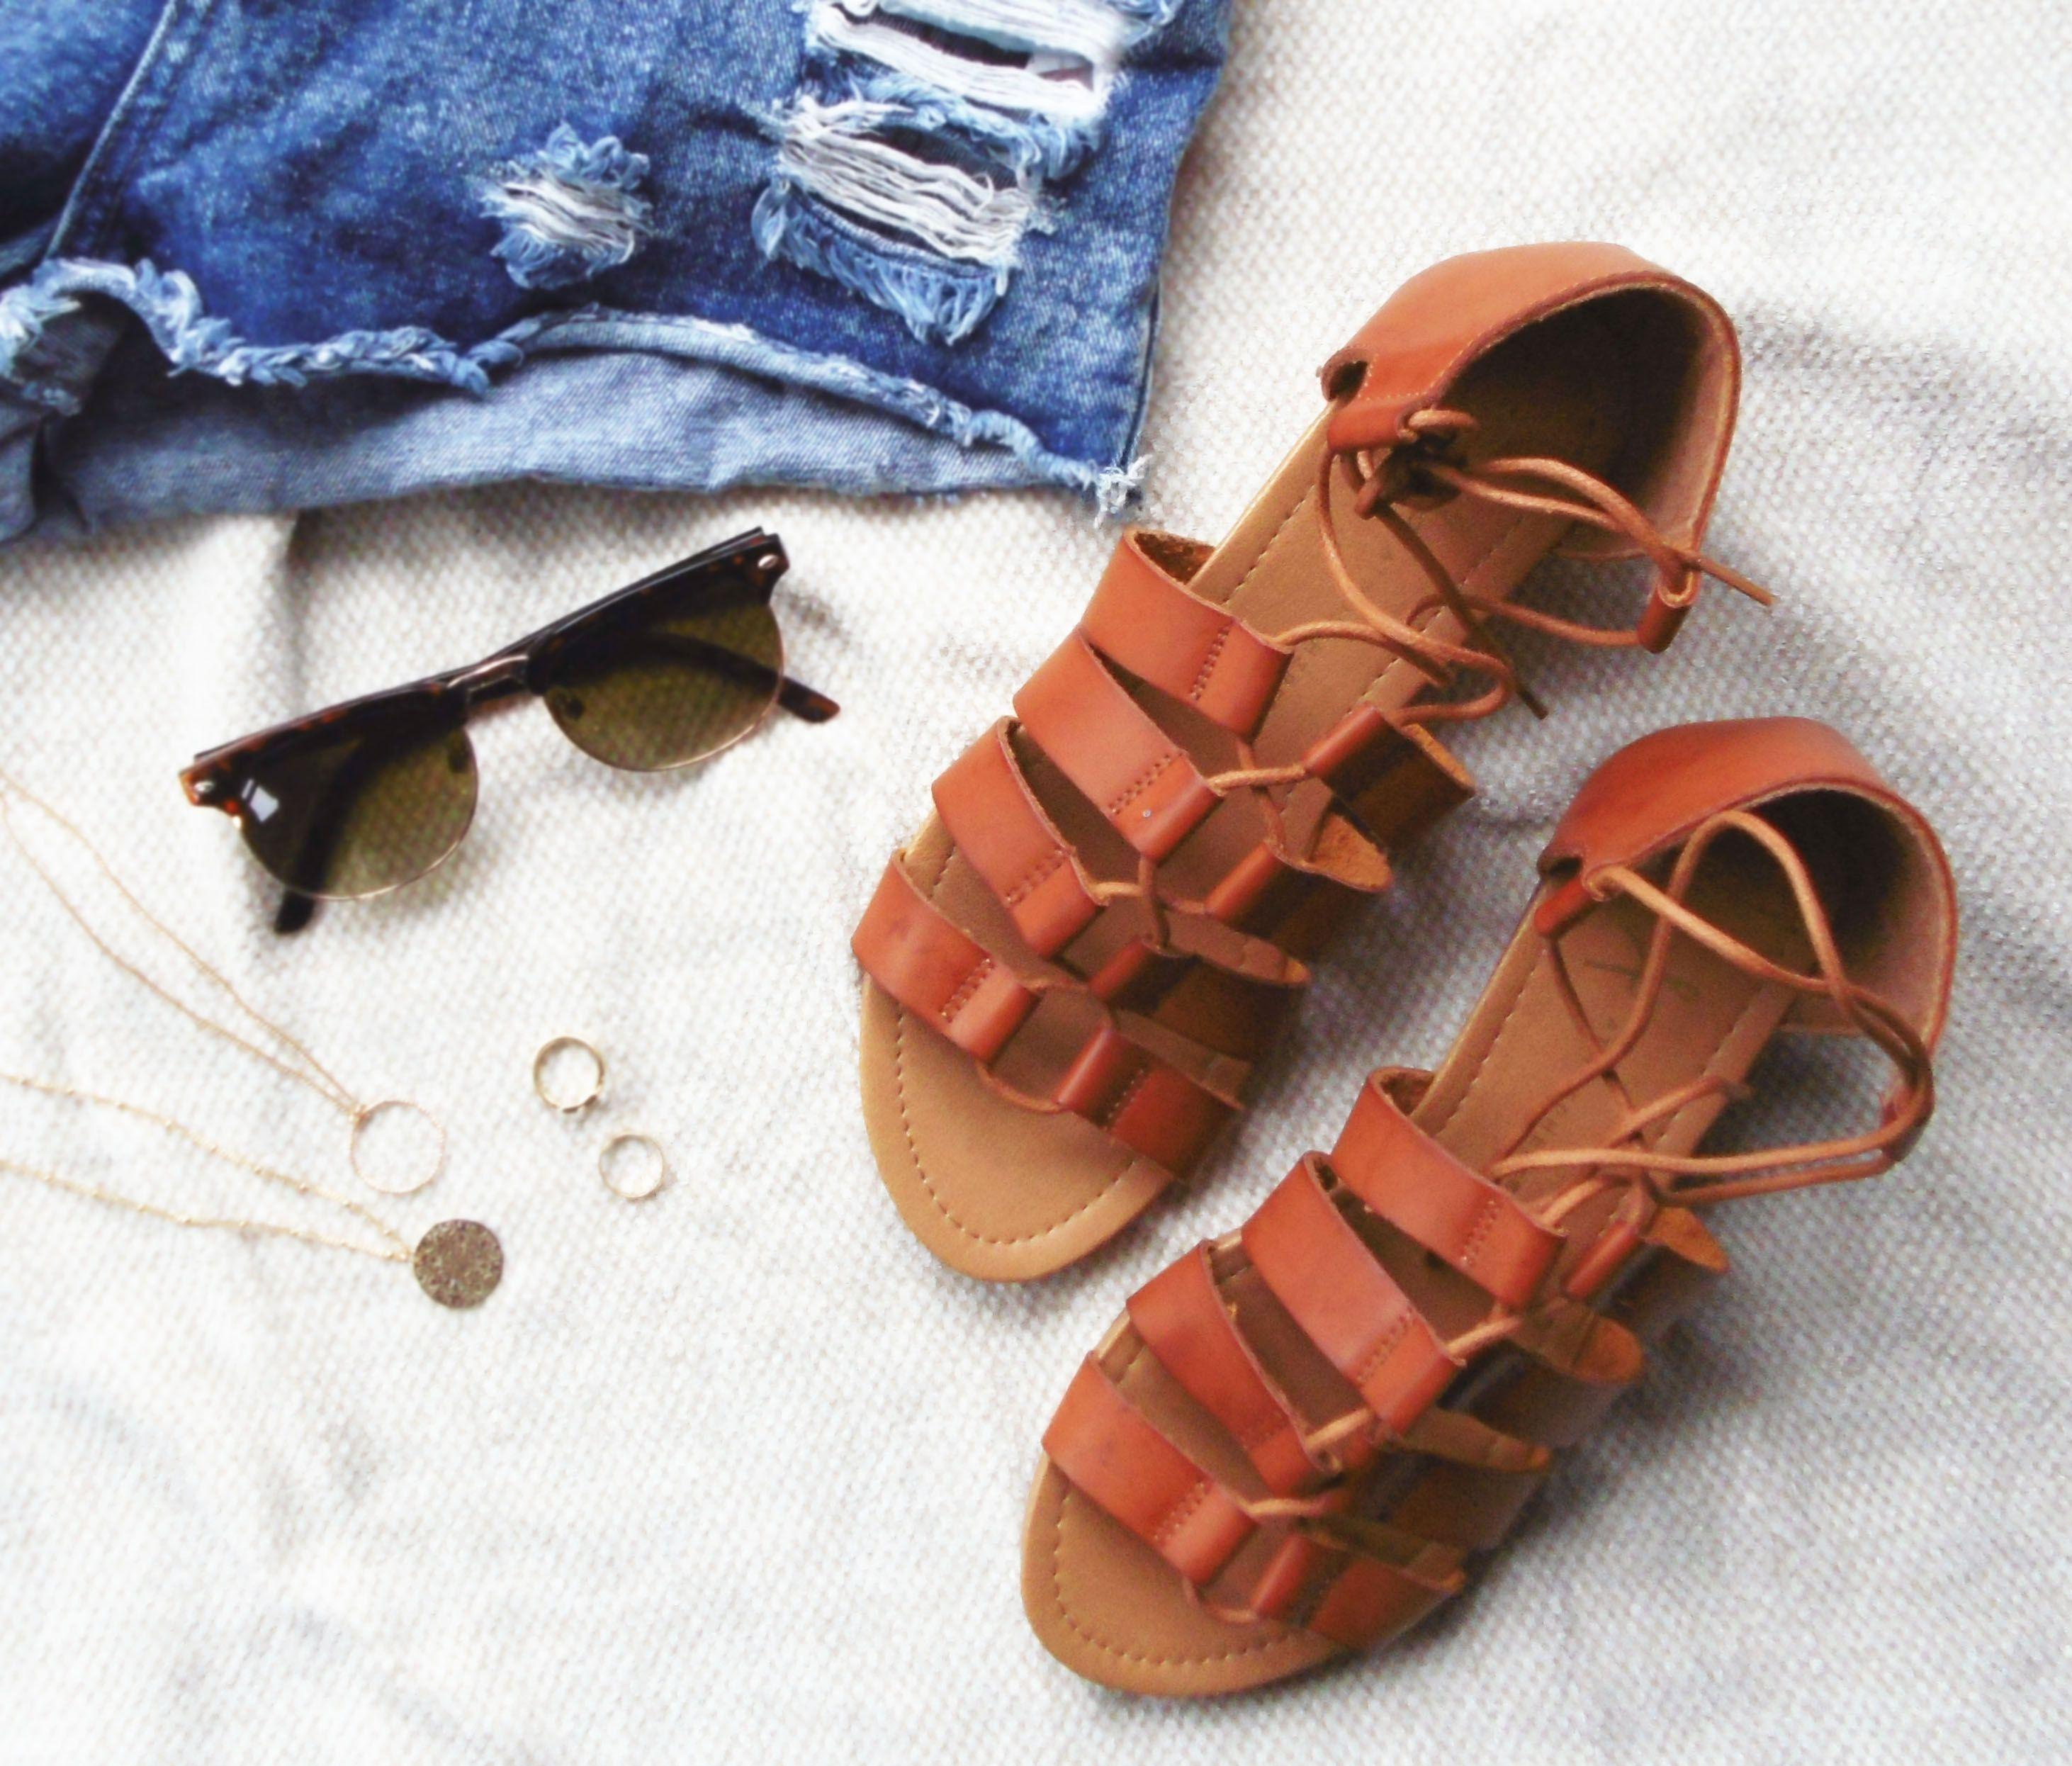 Black sandals primark - Chloe Vibes Primark Ss15 Tan Lace Up Gladiator Sandals Ss15 Sandals